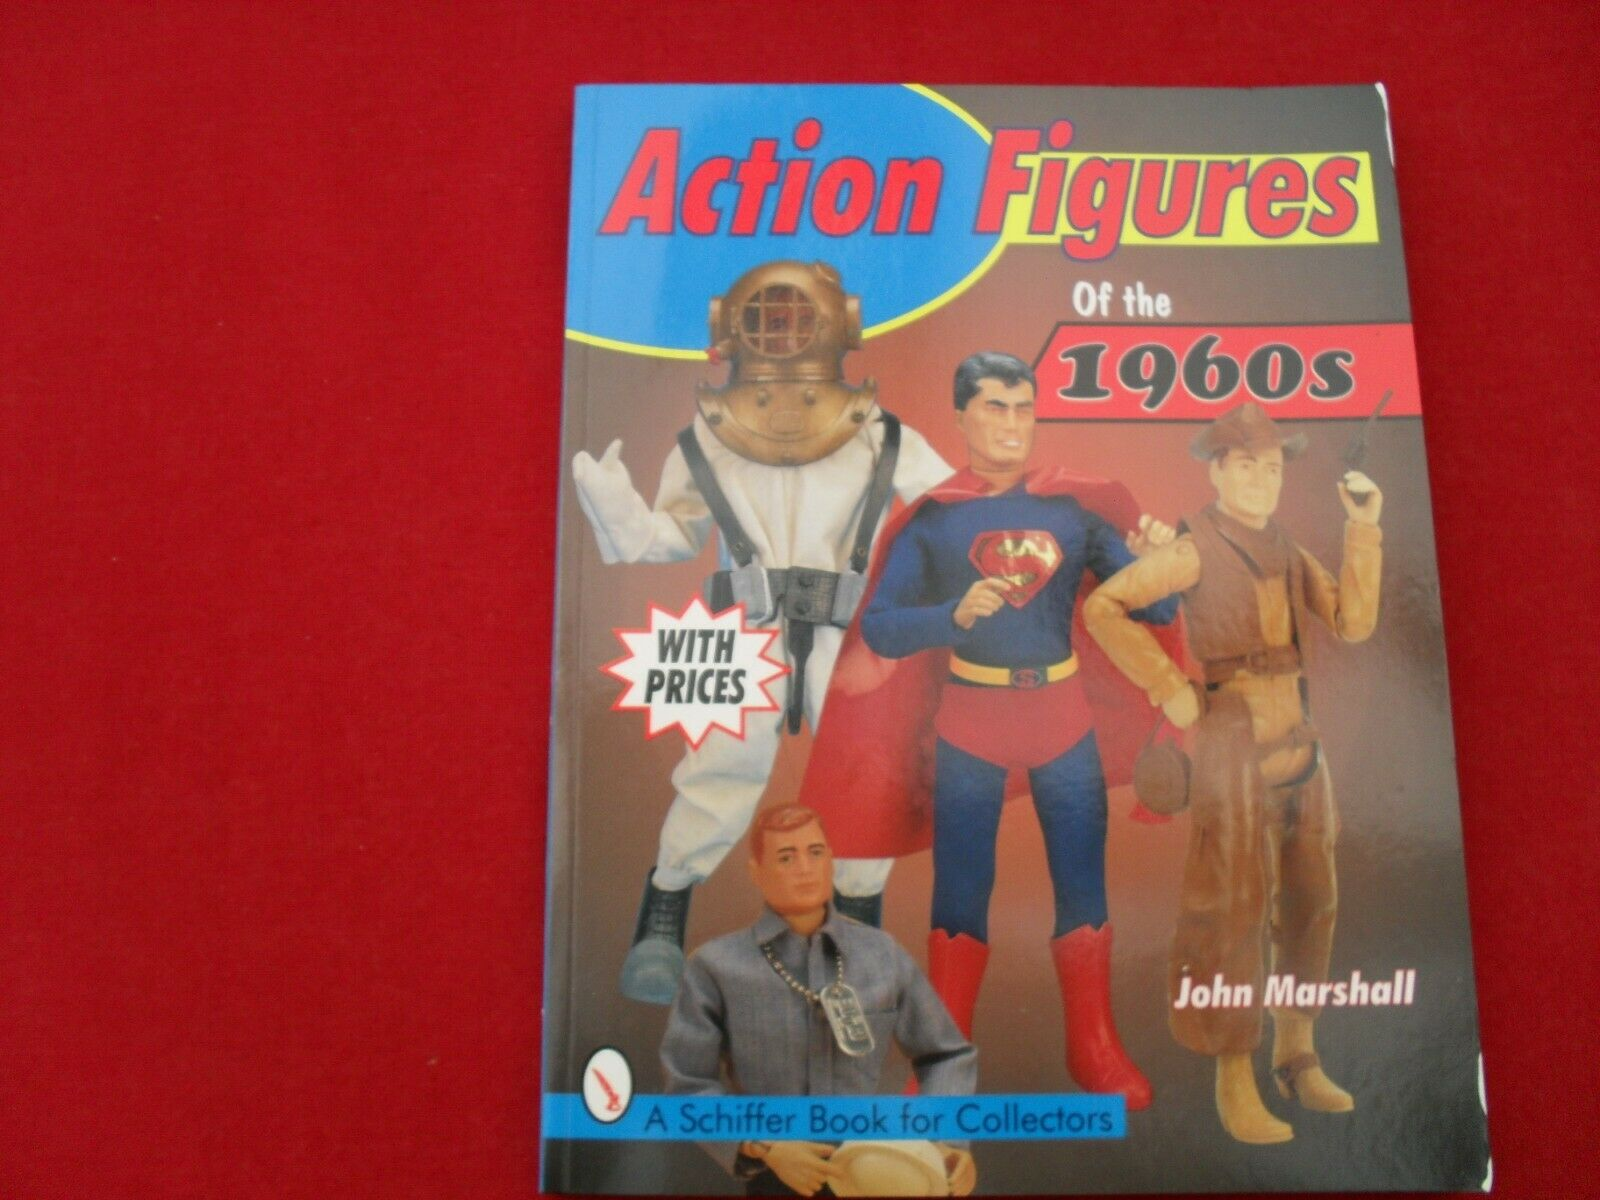 ACTION FIGURES of the 1960s GI JOE CAPTAIN ACTION JOHNNY HERO MAJOR MATT MASON